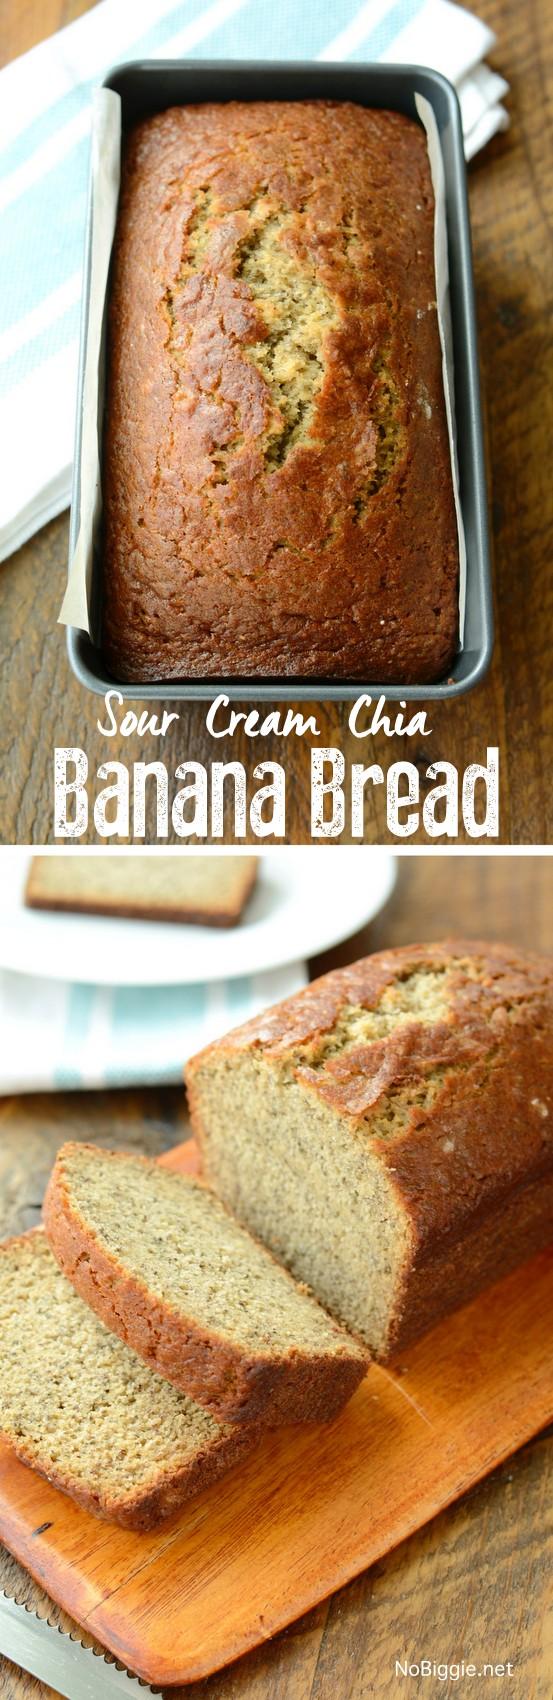 Sour Cream Chia Banana Bread | NoBiggie.net